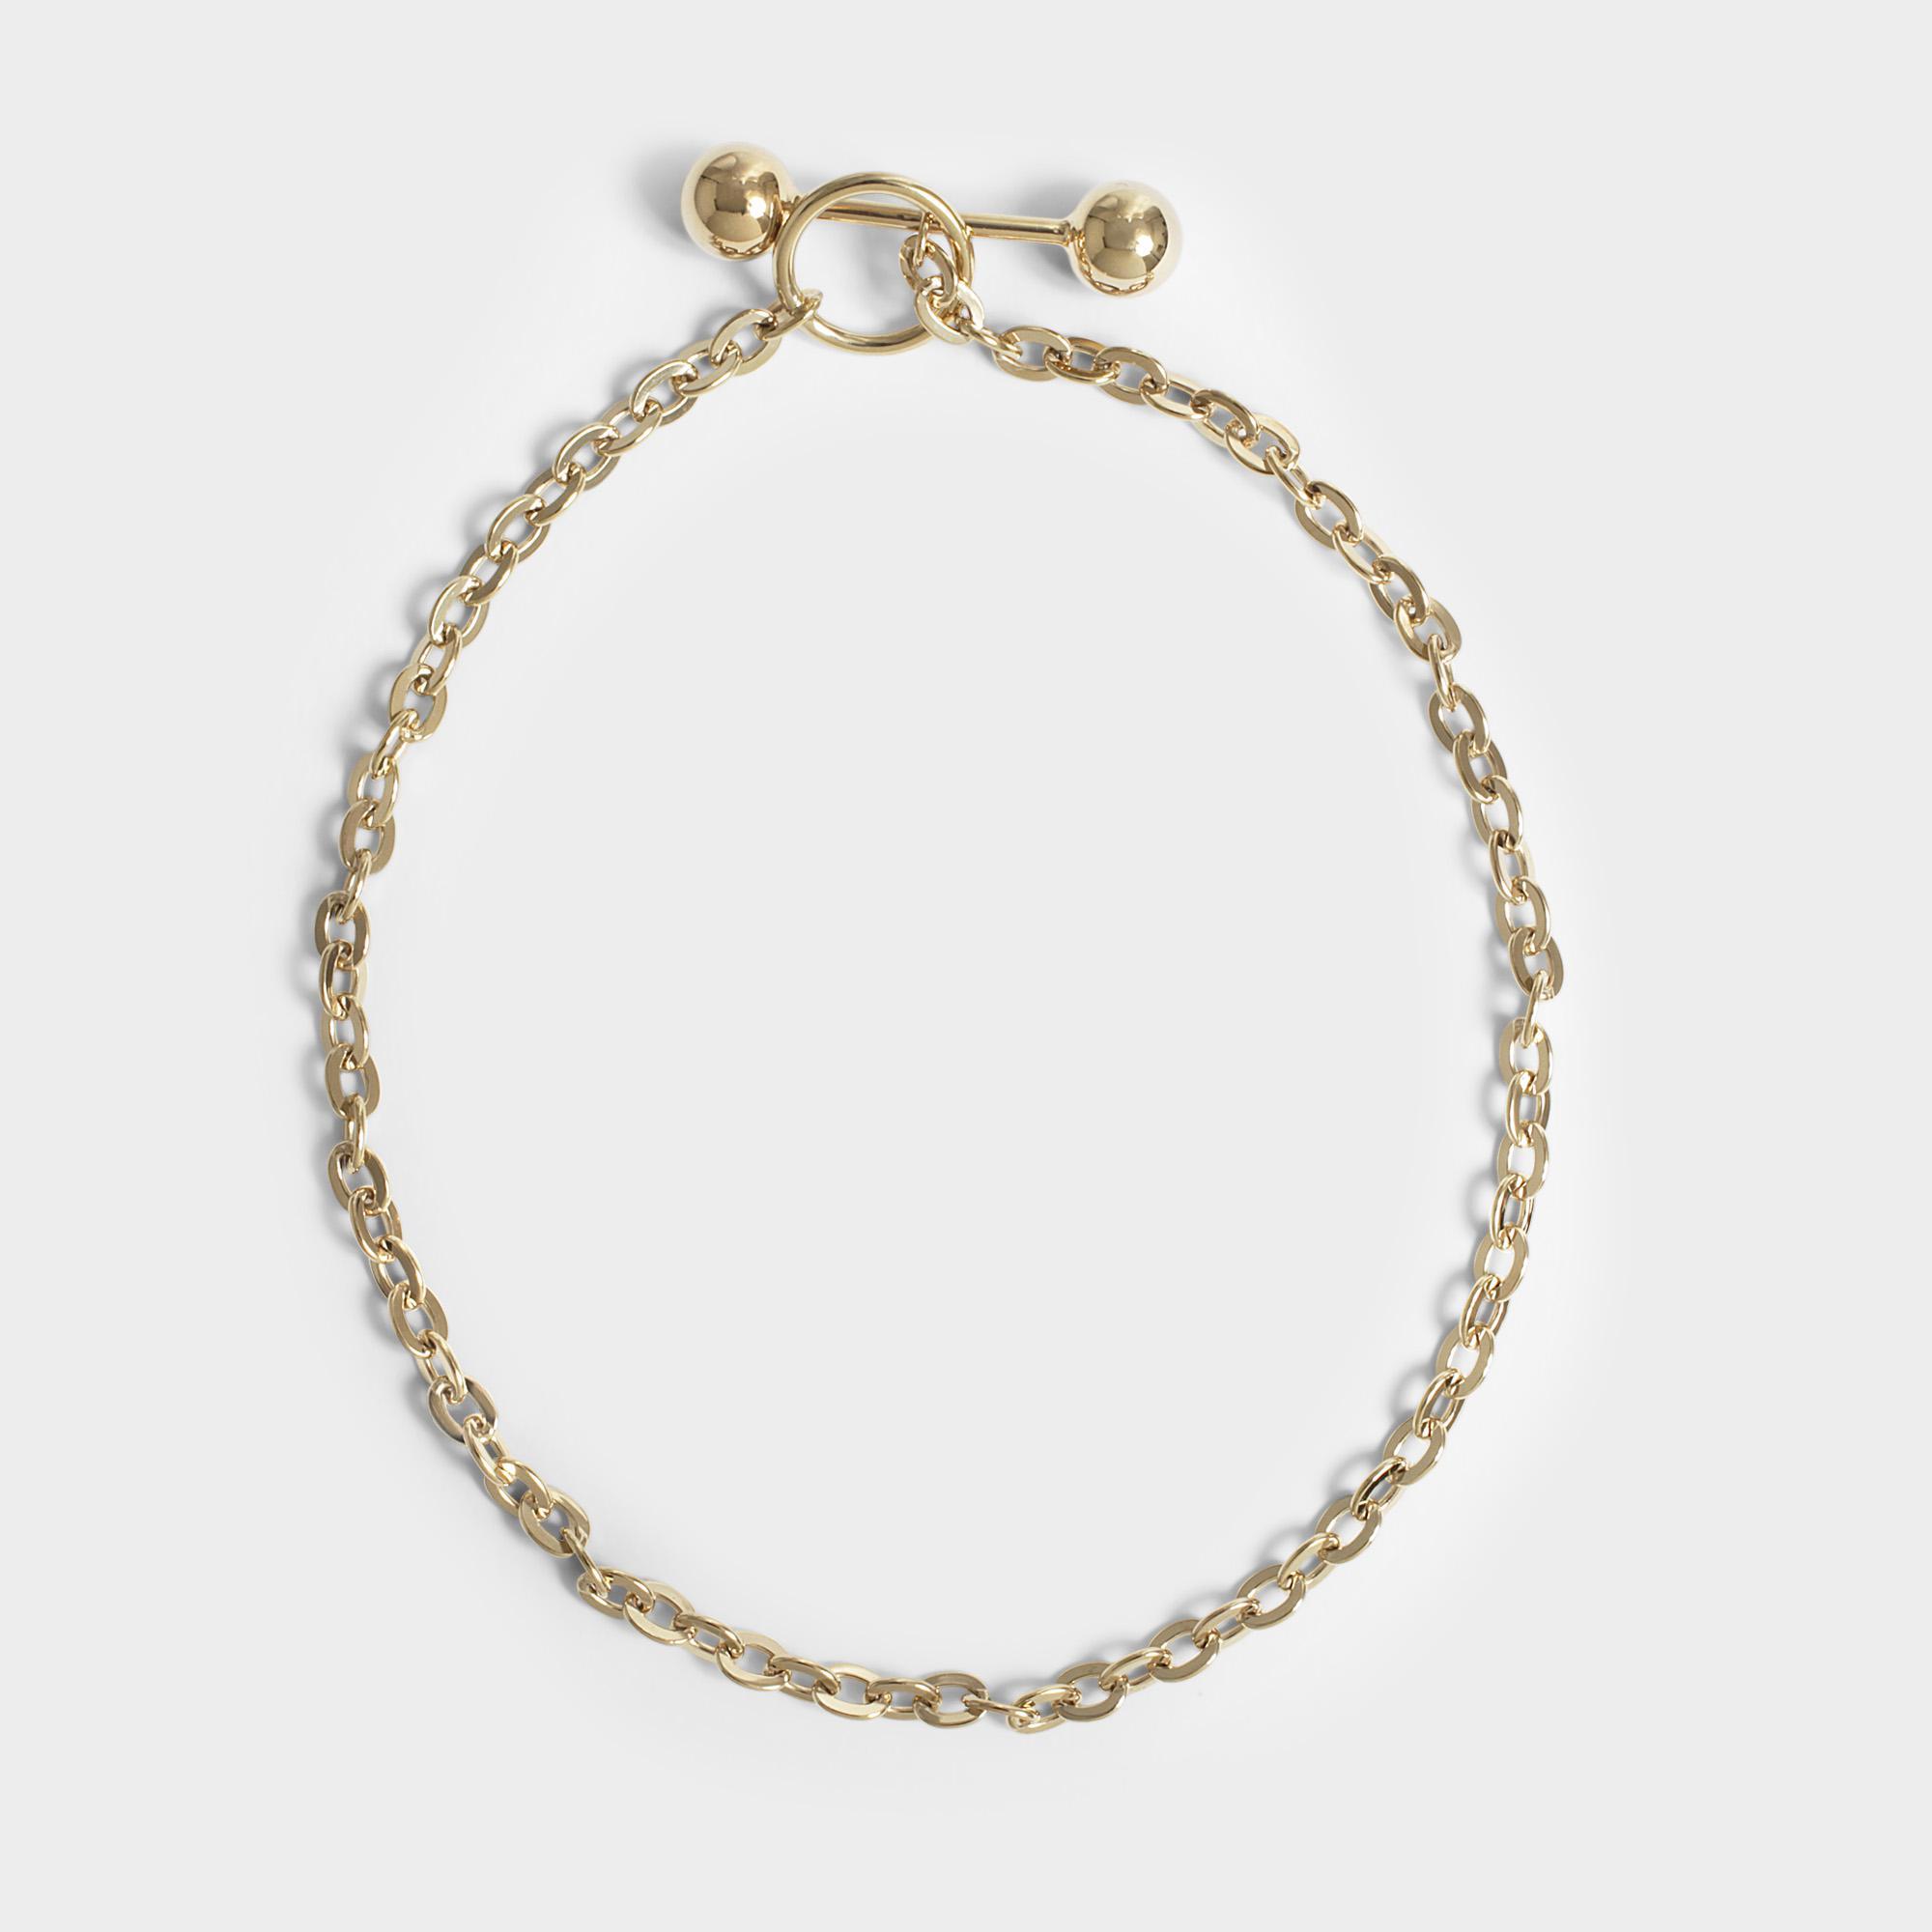 Barbelle Silver Choker Necklace in Silver Saskia Diez g88hp9v3